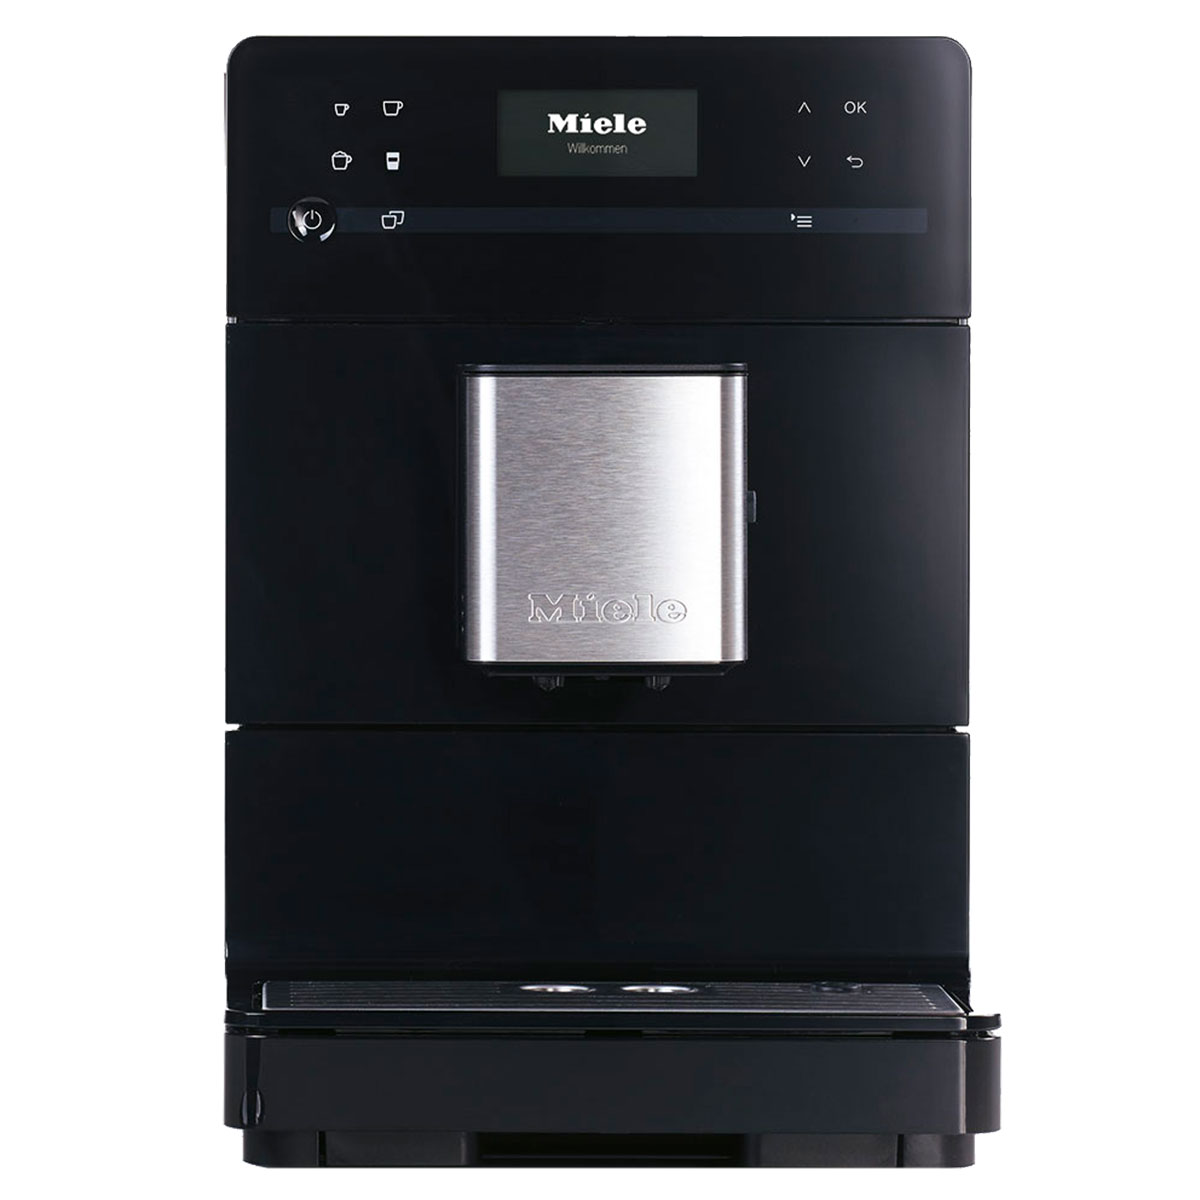 Miele espressomaskine - CM 5300 - Obsidian black